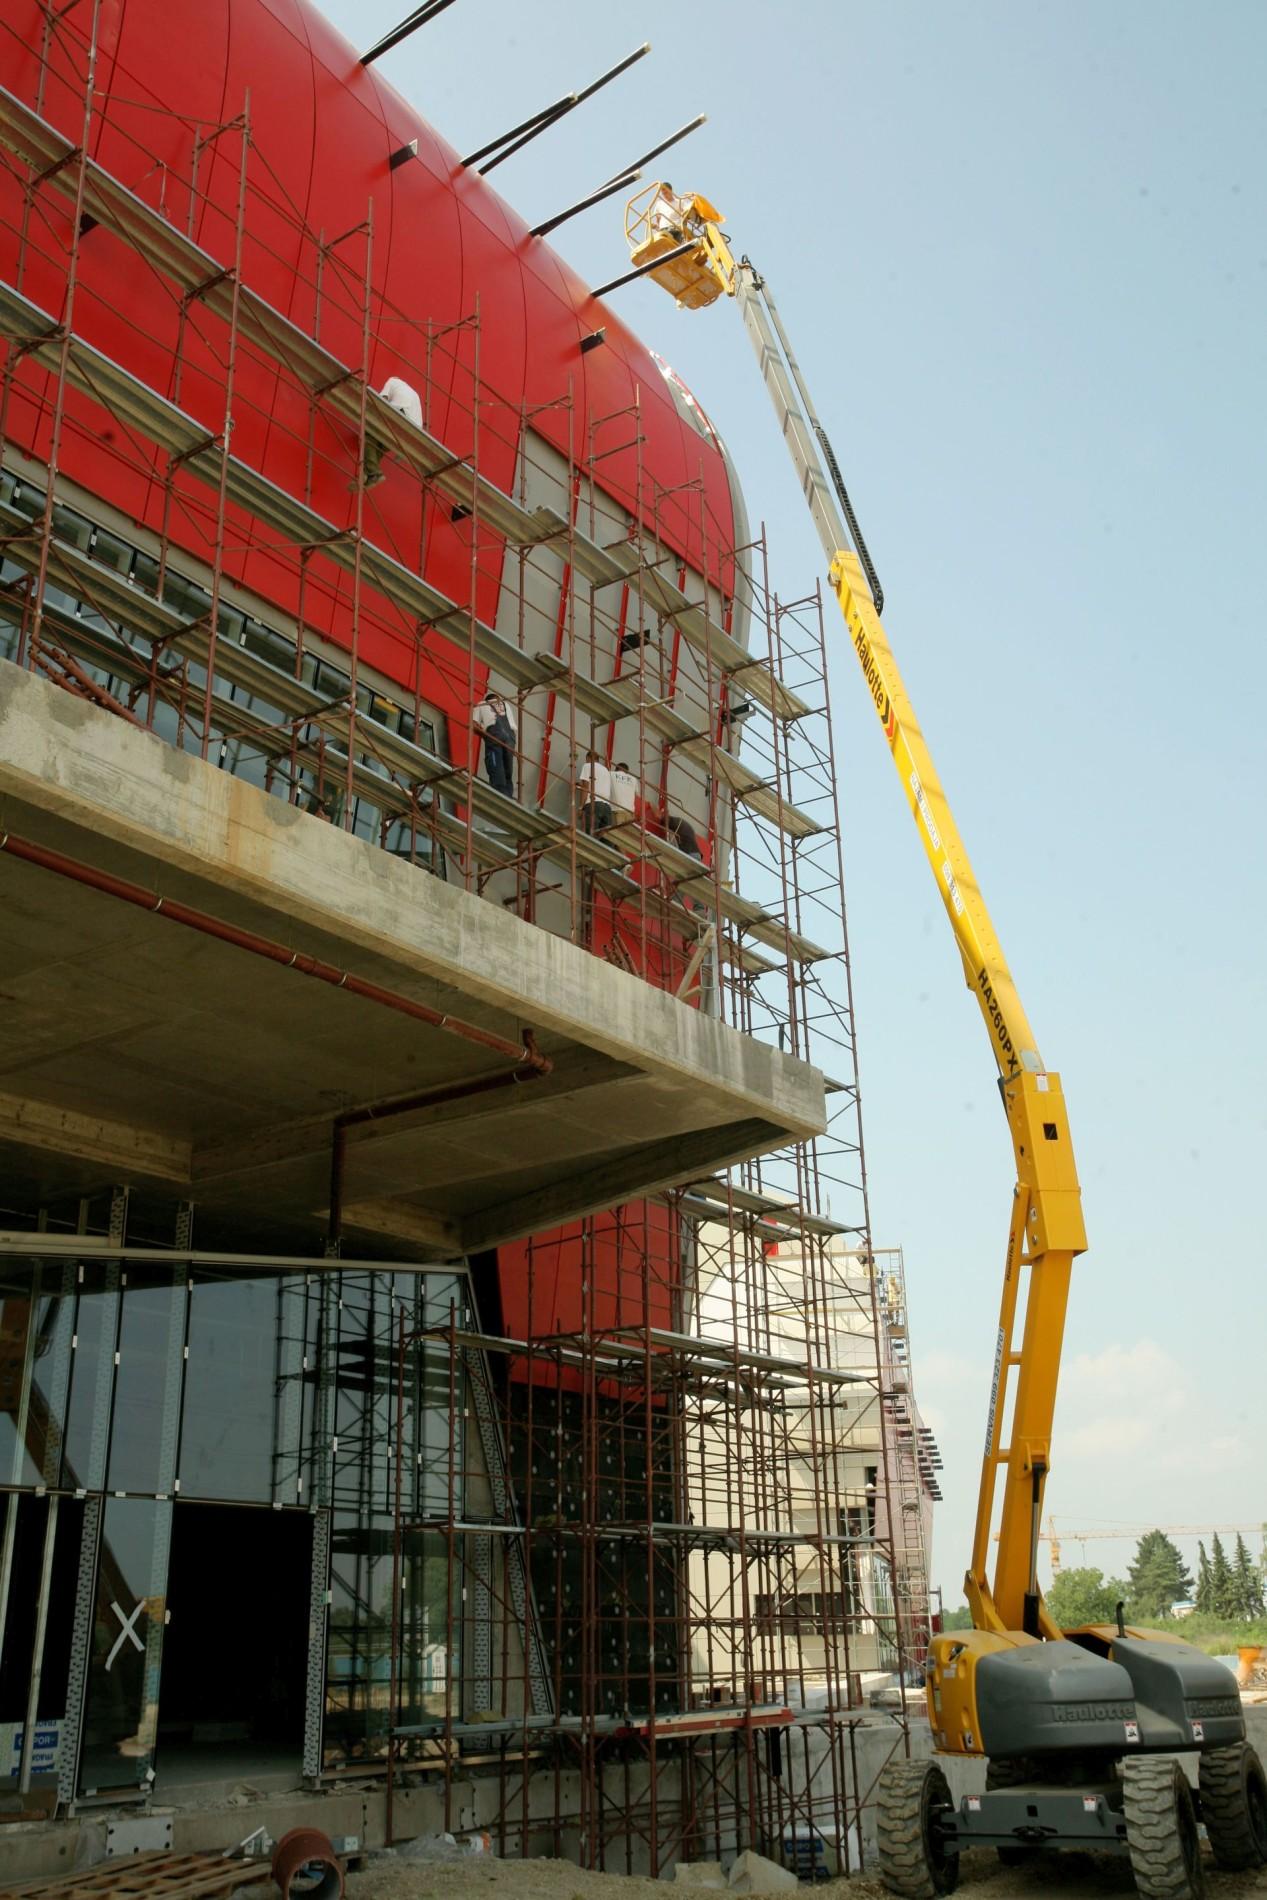 arena centar, beton, concrete, lanište, upi-2m, zagreb, hrvatska, upi2m, structure, konstrukcija